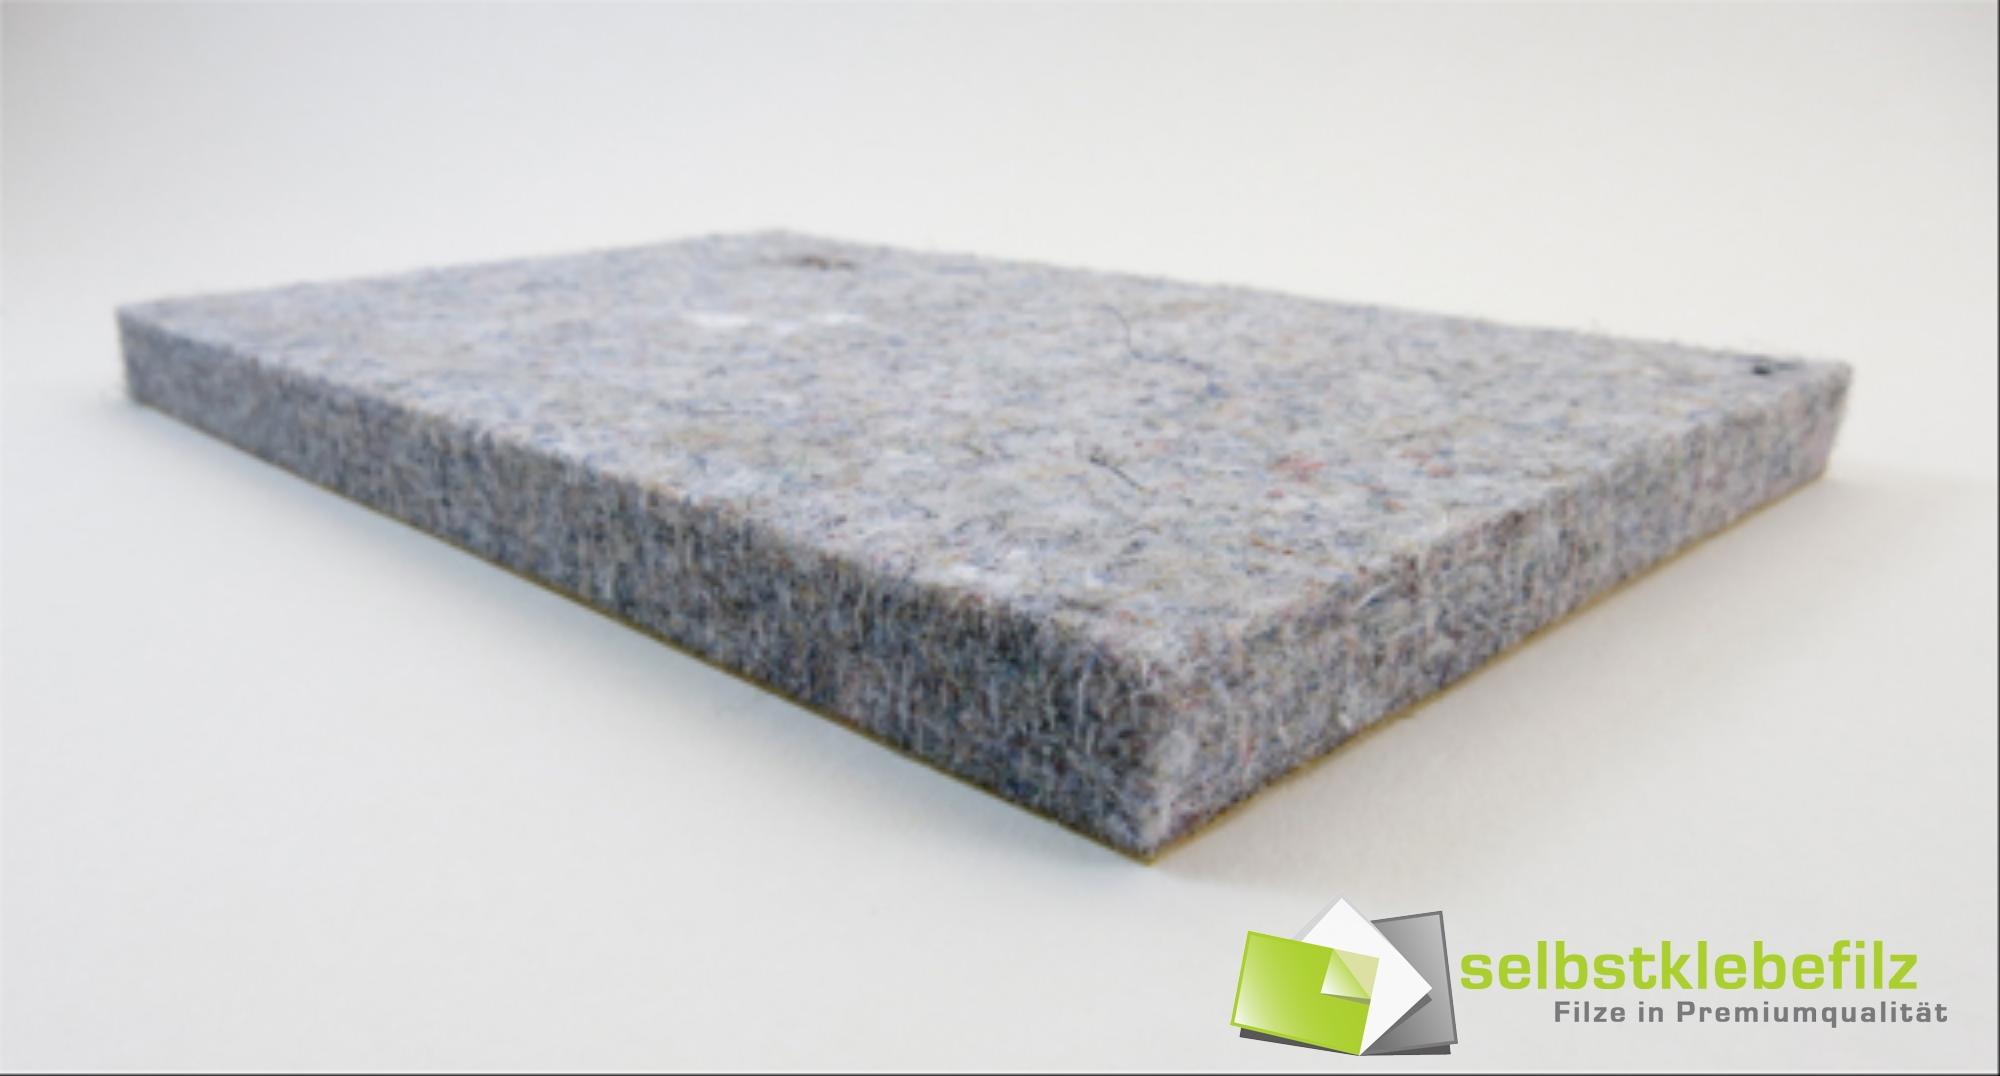 filzplatte grau 10mm dick filzgleiter filz selbstklebend din a1 a2 a3 a4 a5 a6 ebay. Black Bedroom Furniture Sets. Home Design Ideas